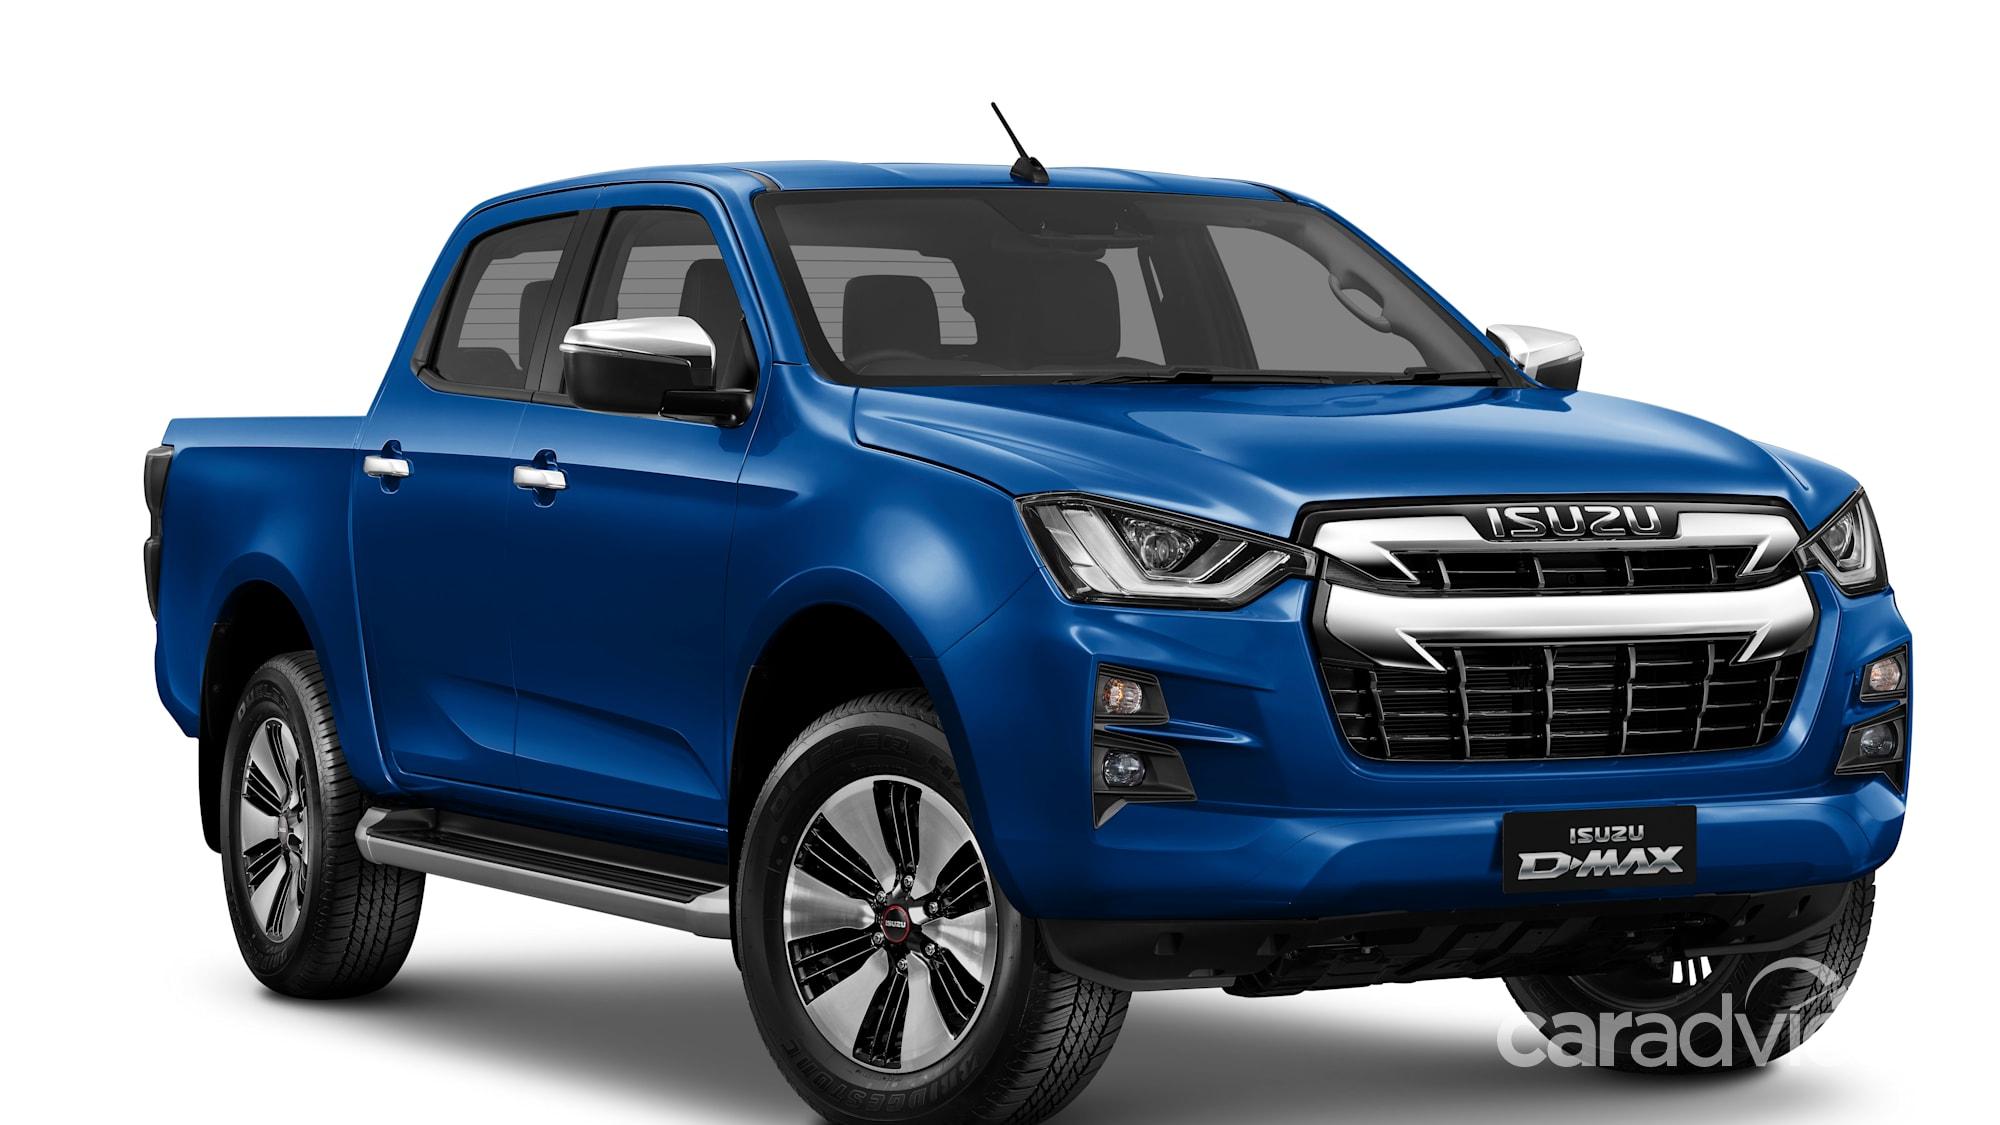 2021 Isuzu D-Max: What each model offers | CarAdvice